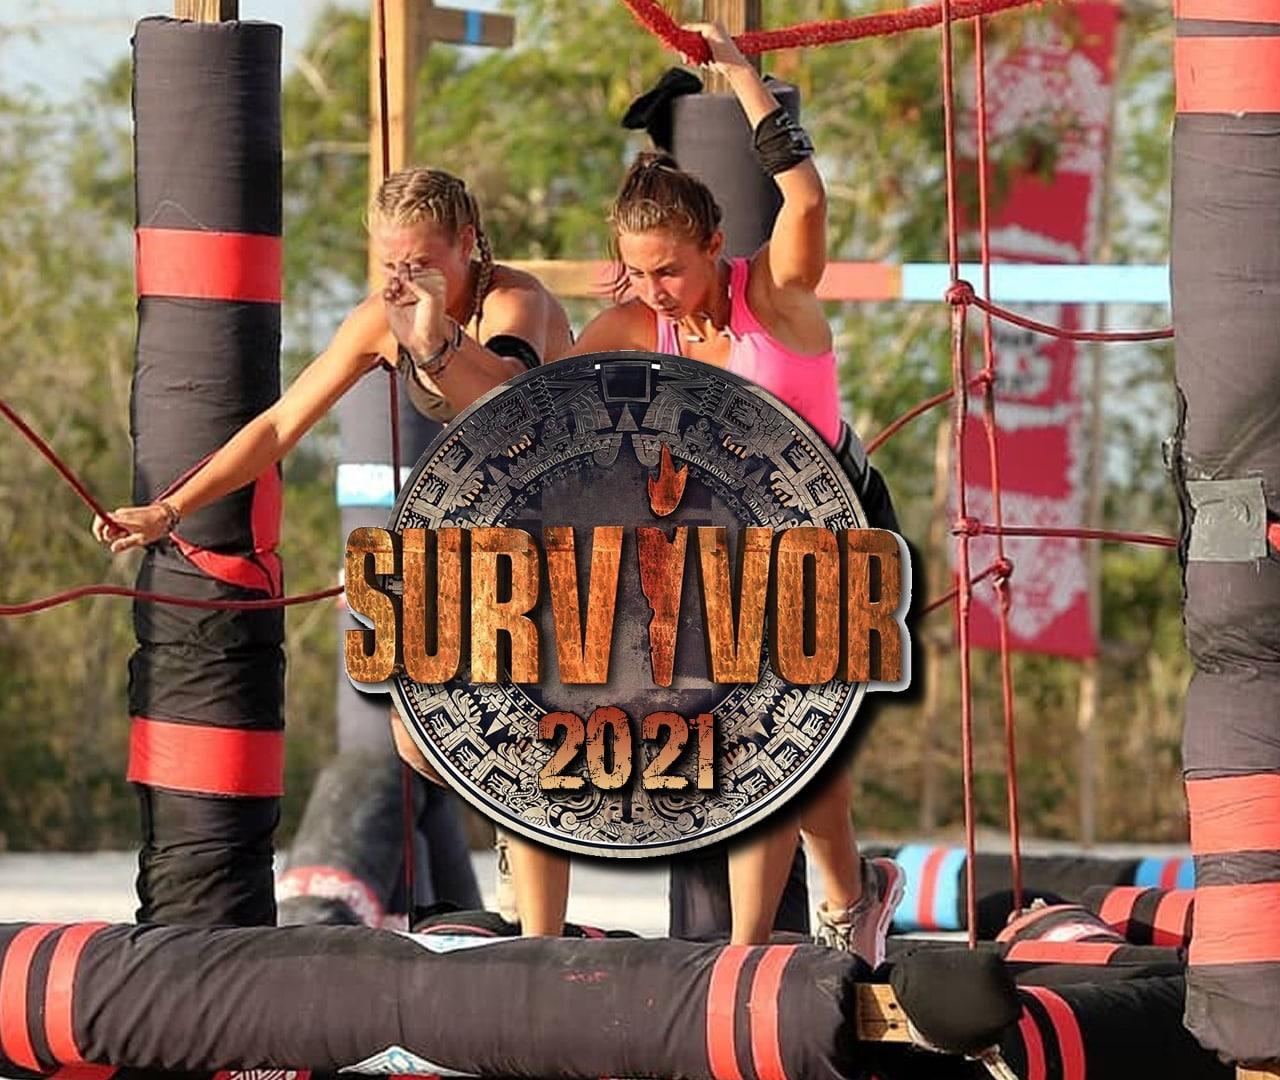 Survivor ,survivor 2021,survivor 4,survivor 2020,survivor 1,survivor 1 παικτεσ,survivor 2020 παικτεσ